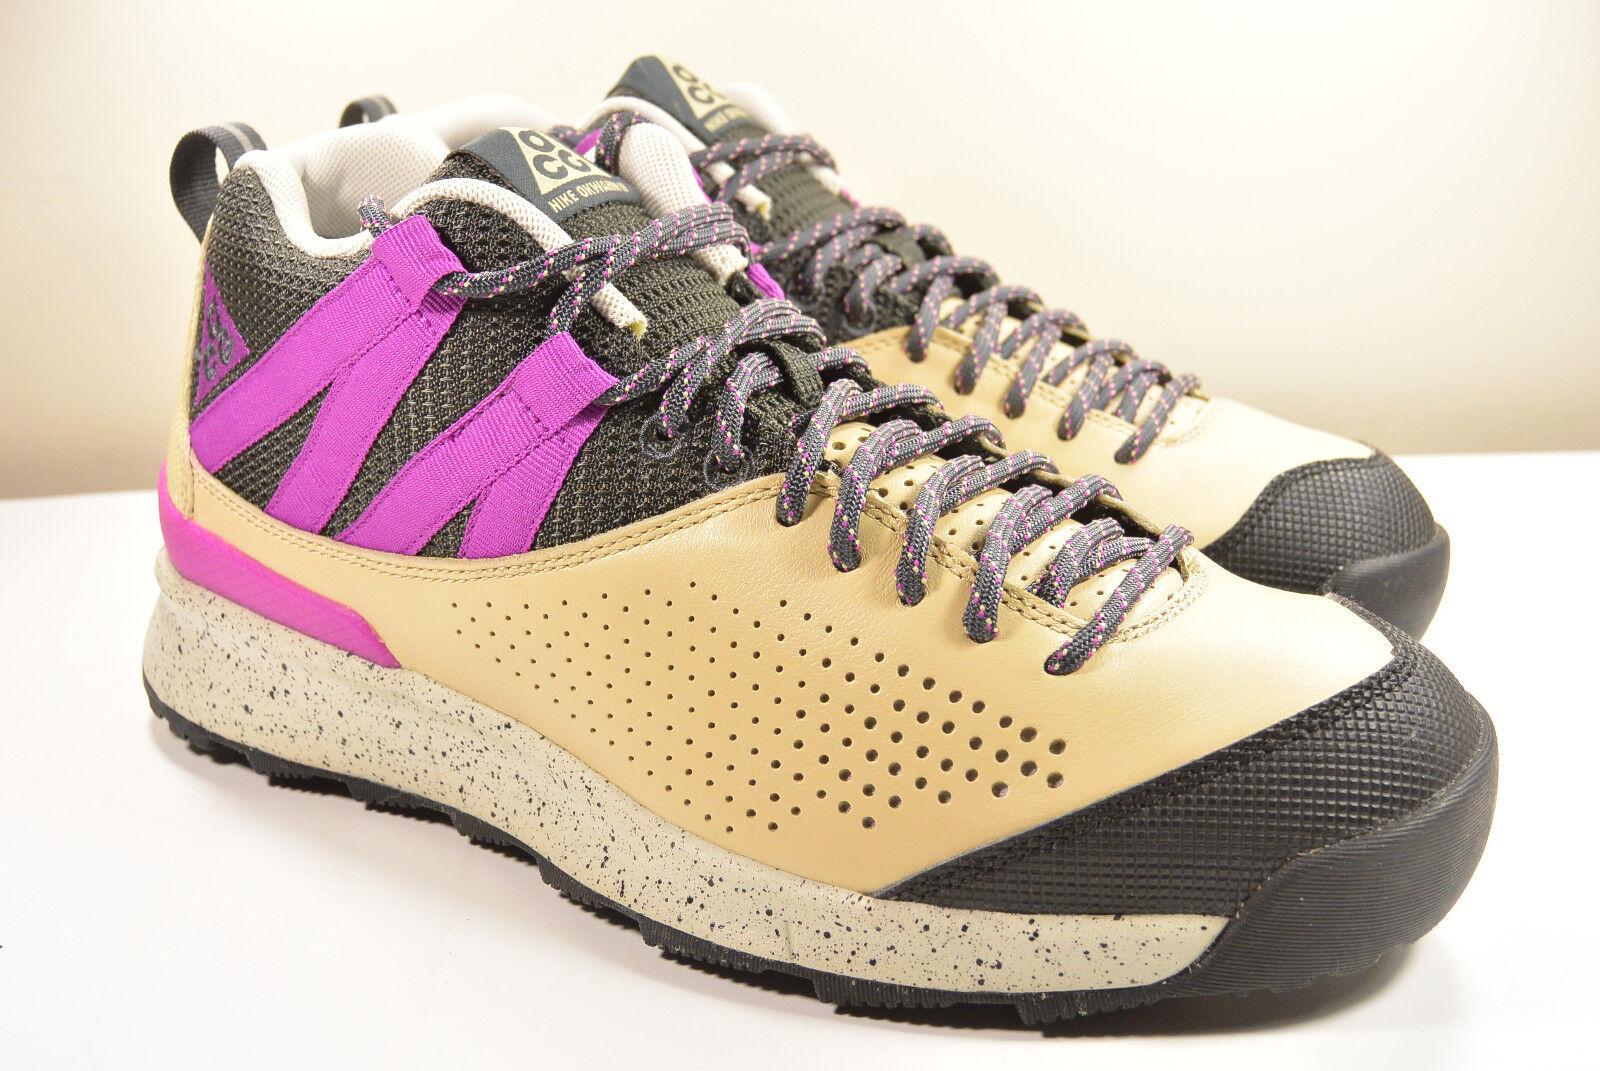 DS Nike 2012 Acg okwahn II VGS oro 11 MOWABB Footscape Hyperfuse Rift Presto